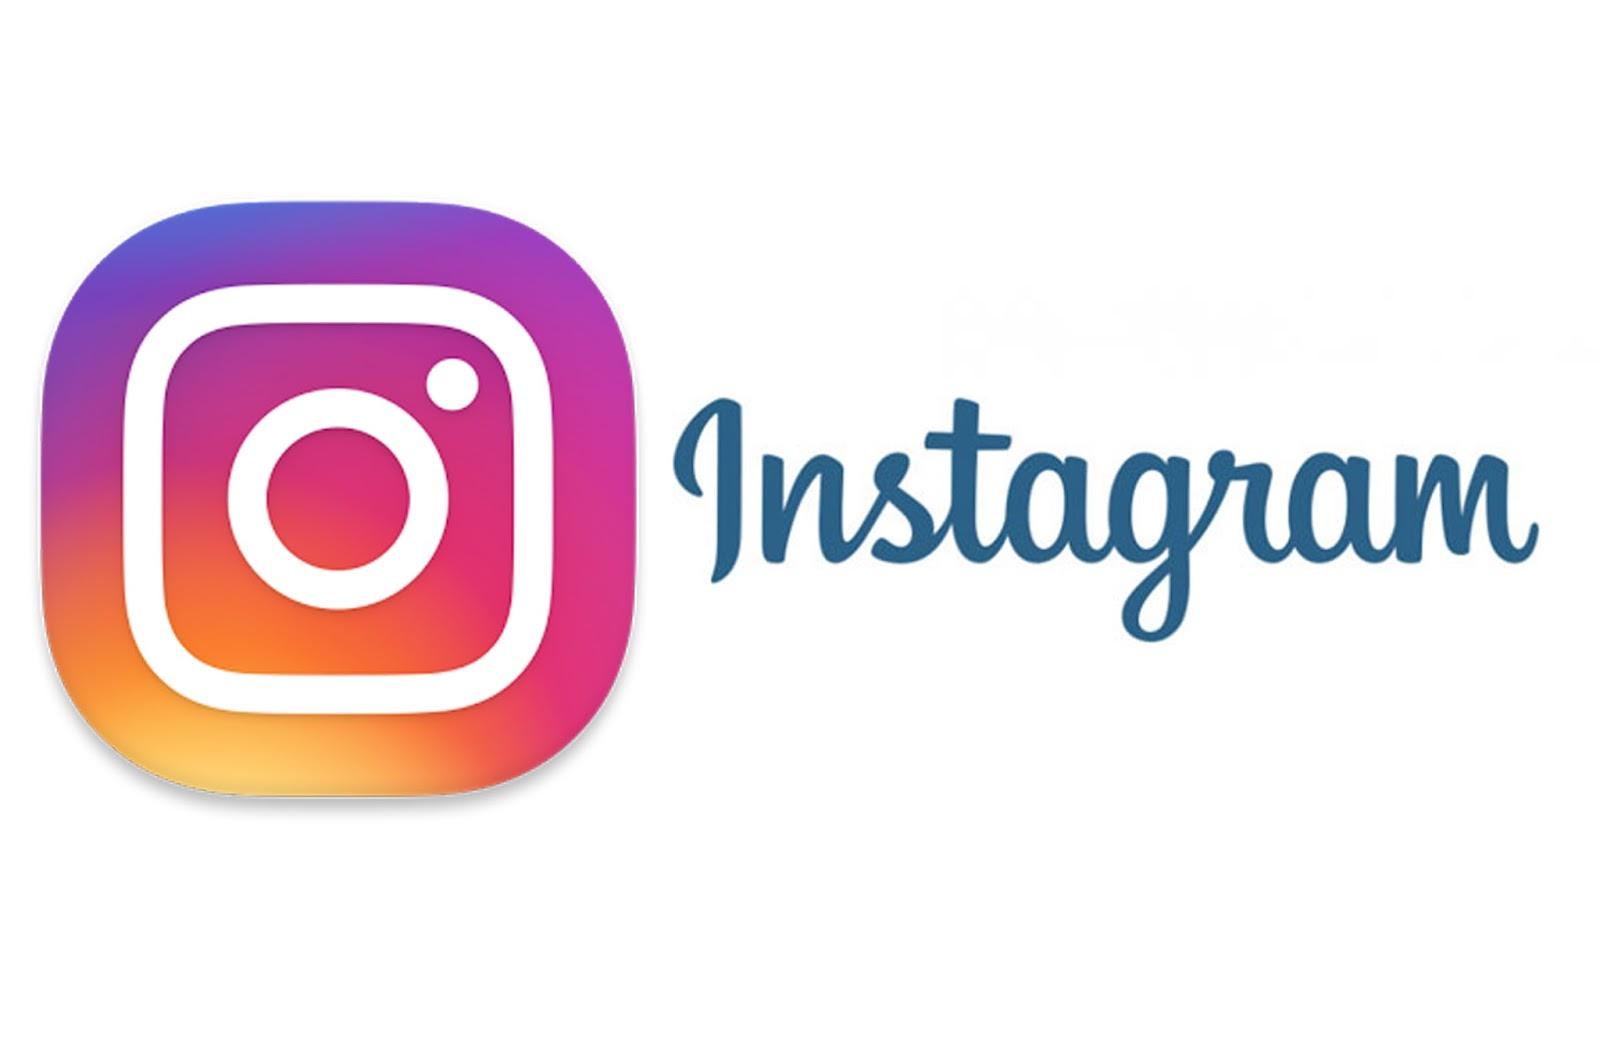 asortik instagramda